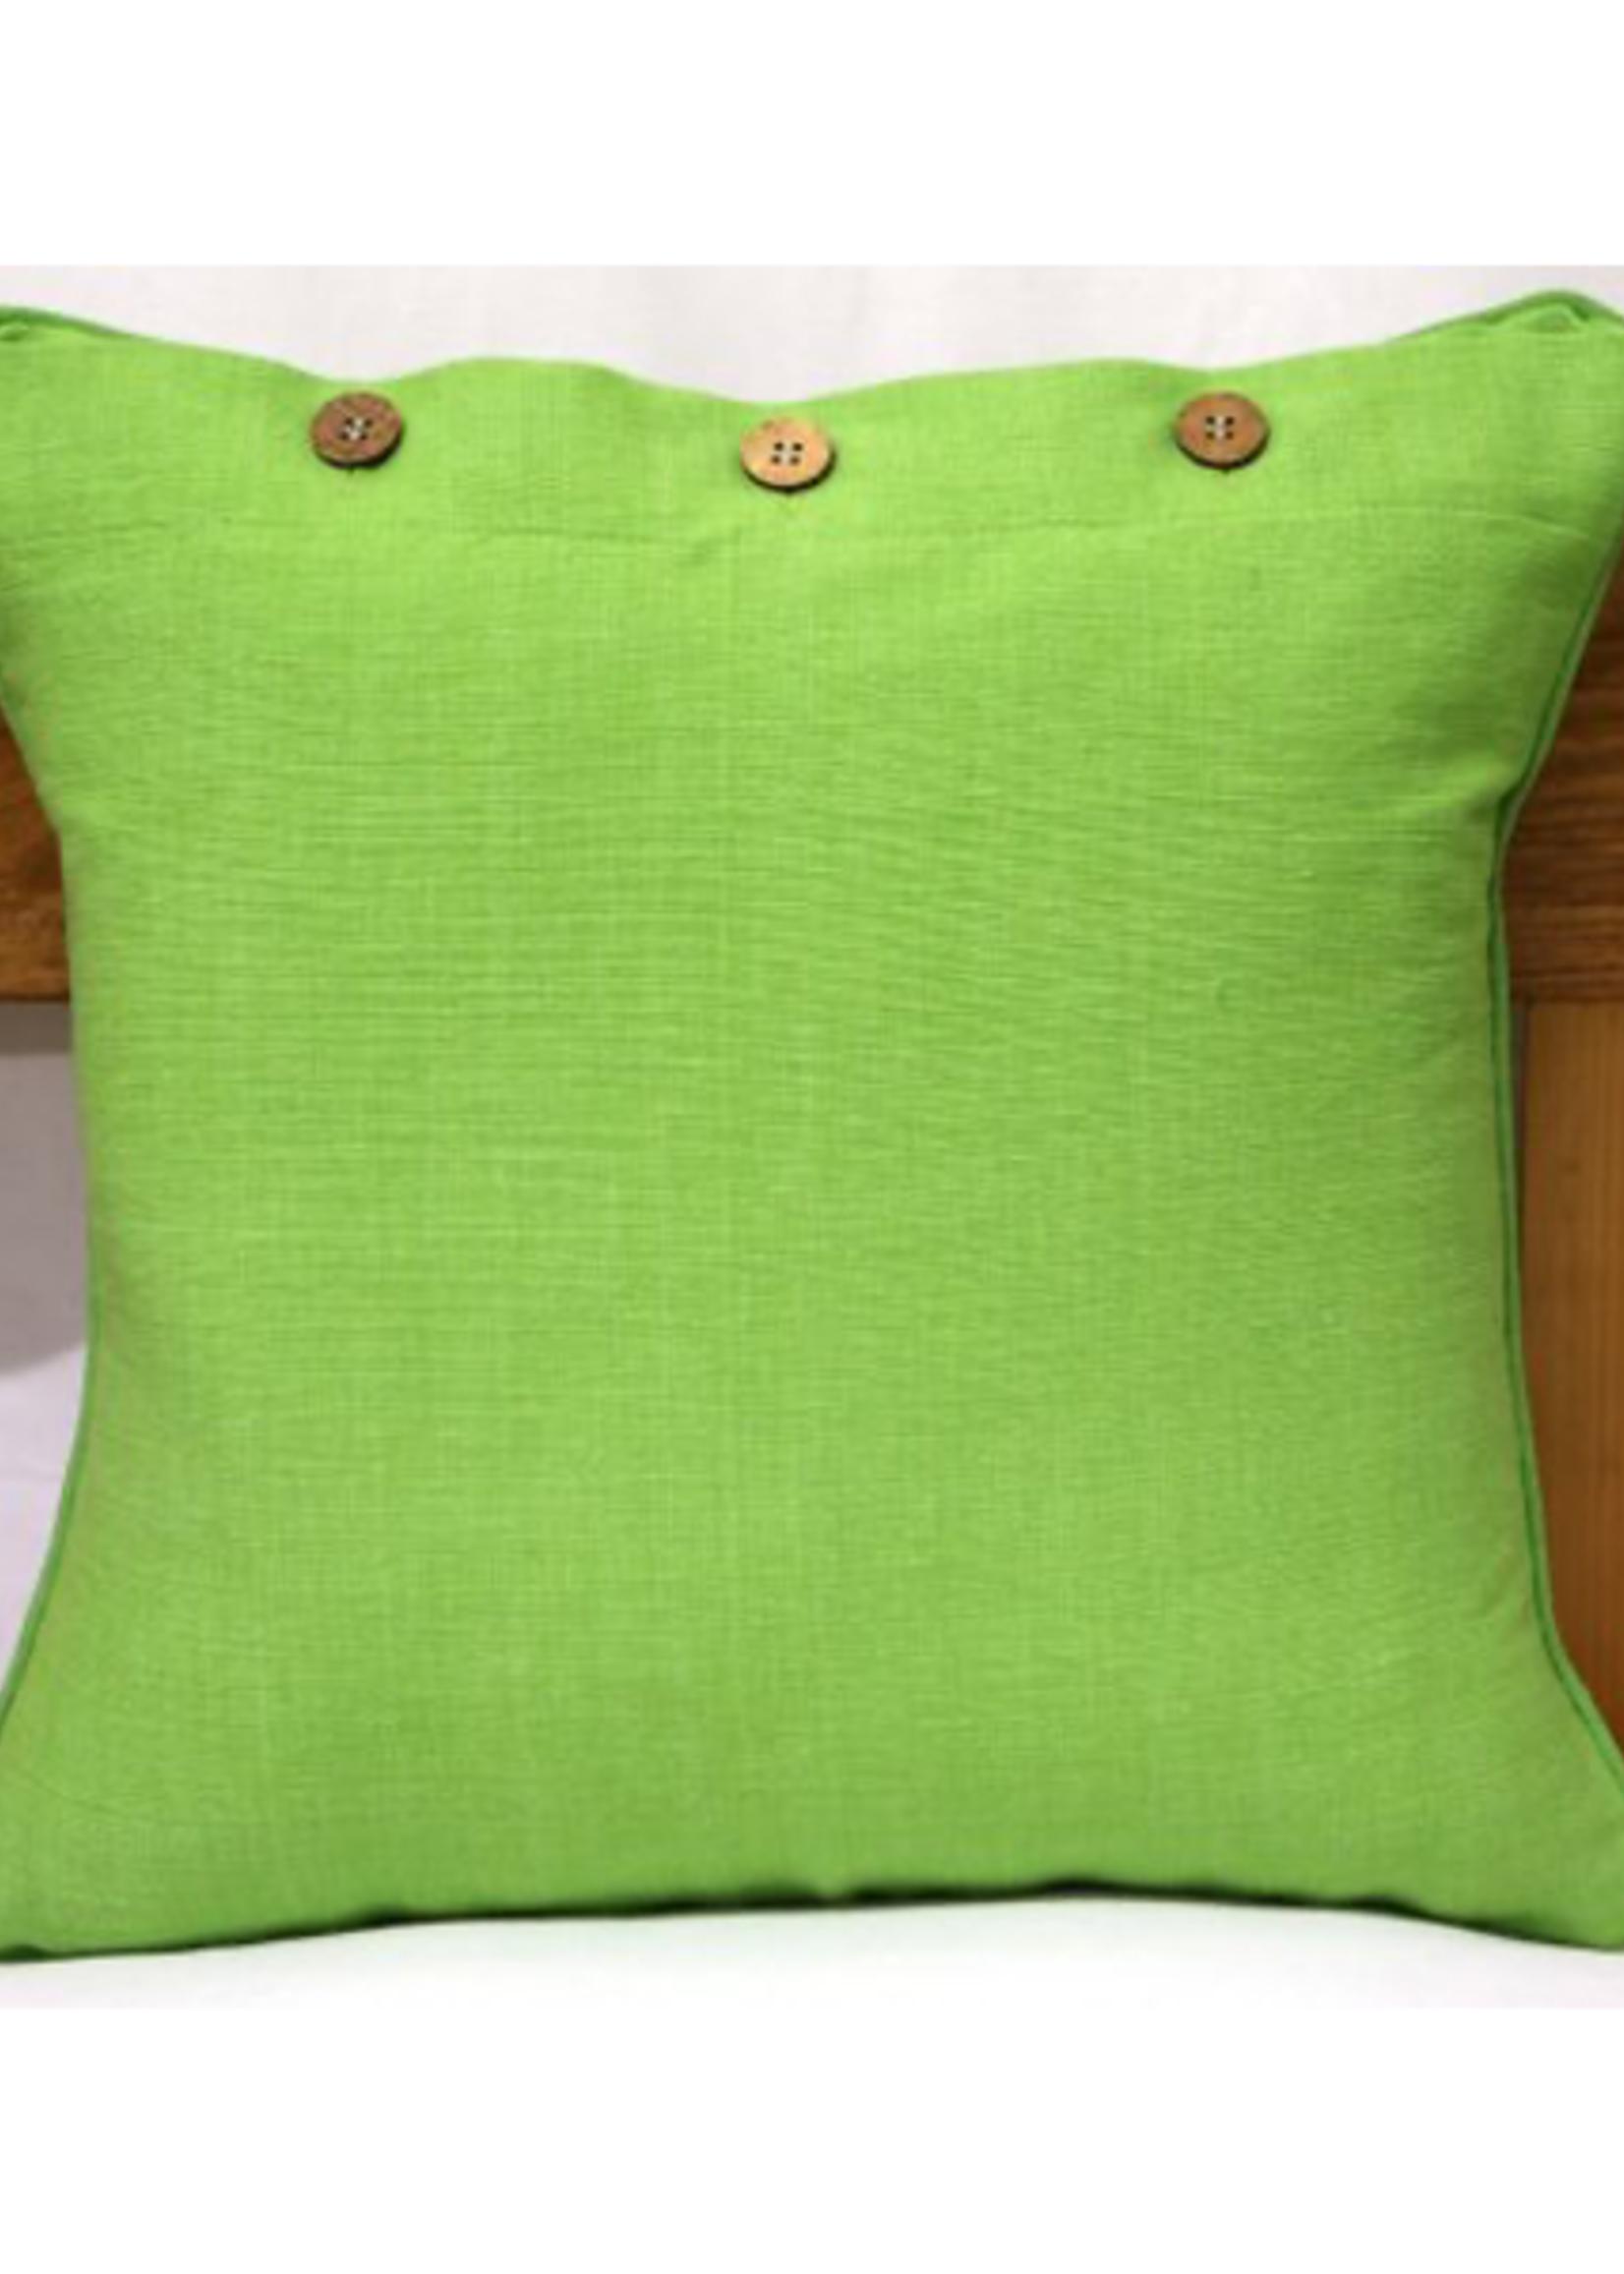 Craft Studio Green Cushion Cover 40x40cm